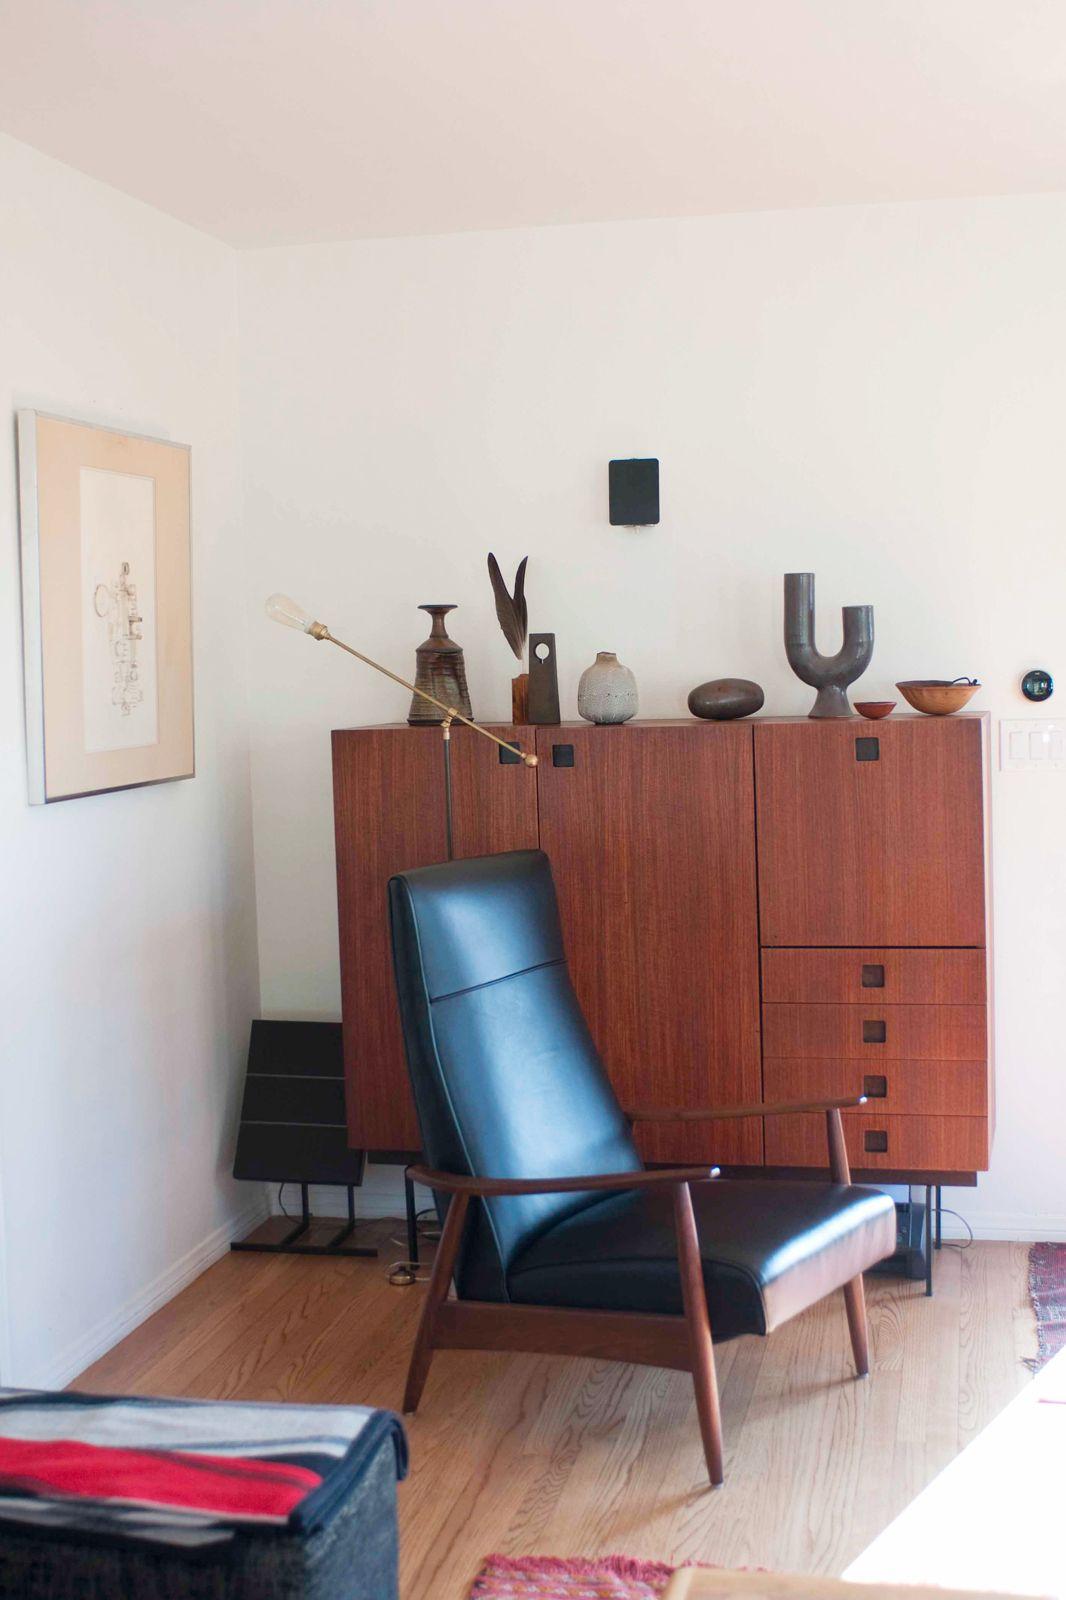 Momo suzuki black crane fashion minimalist decor home